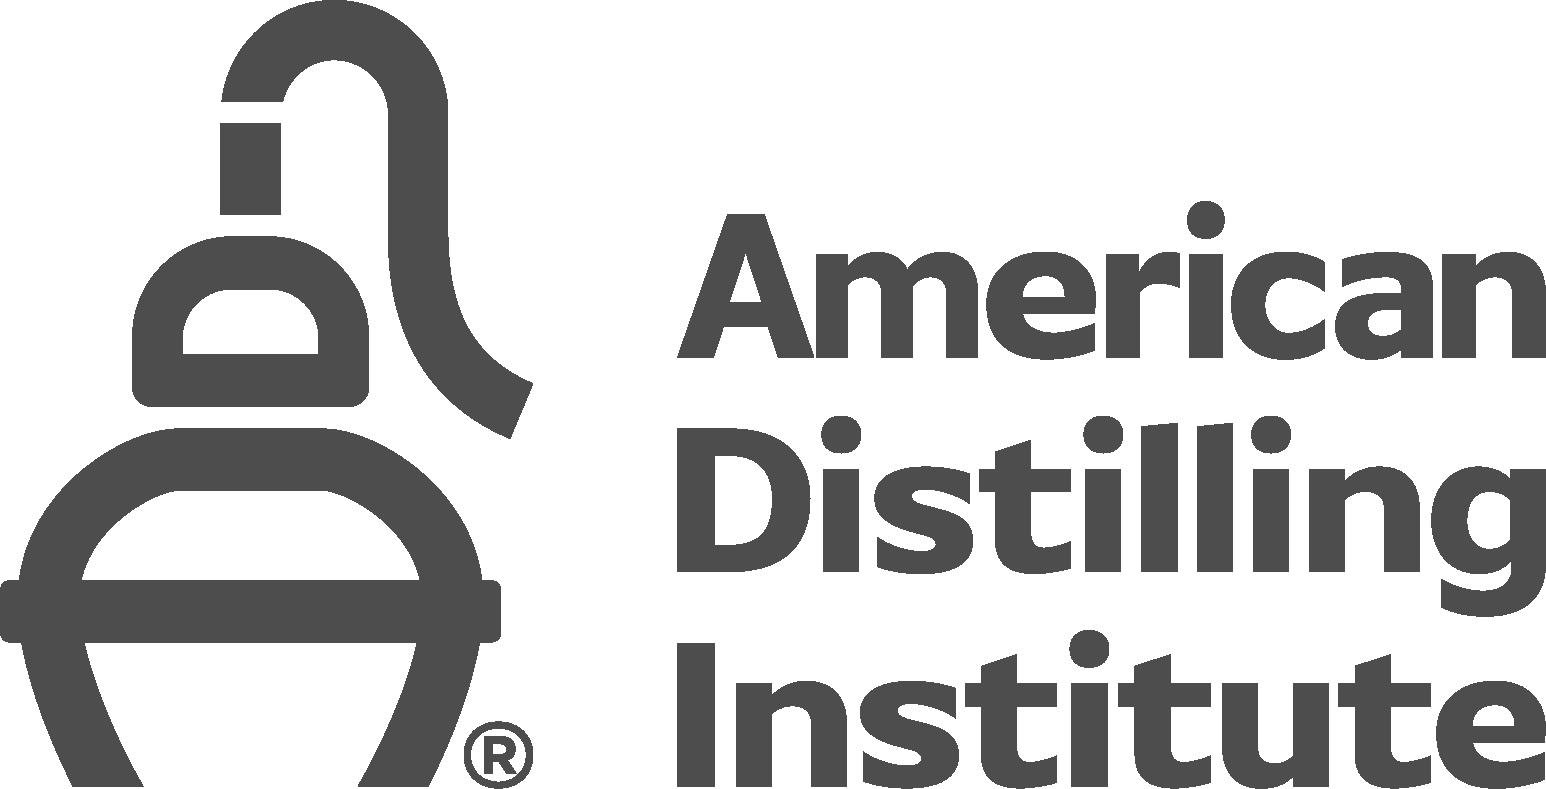 ADI Primary Logo Charcoal